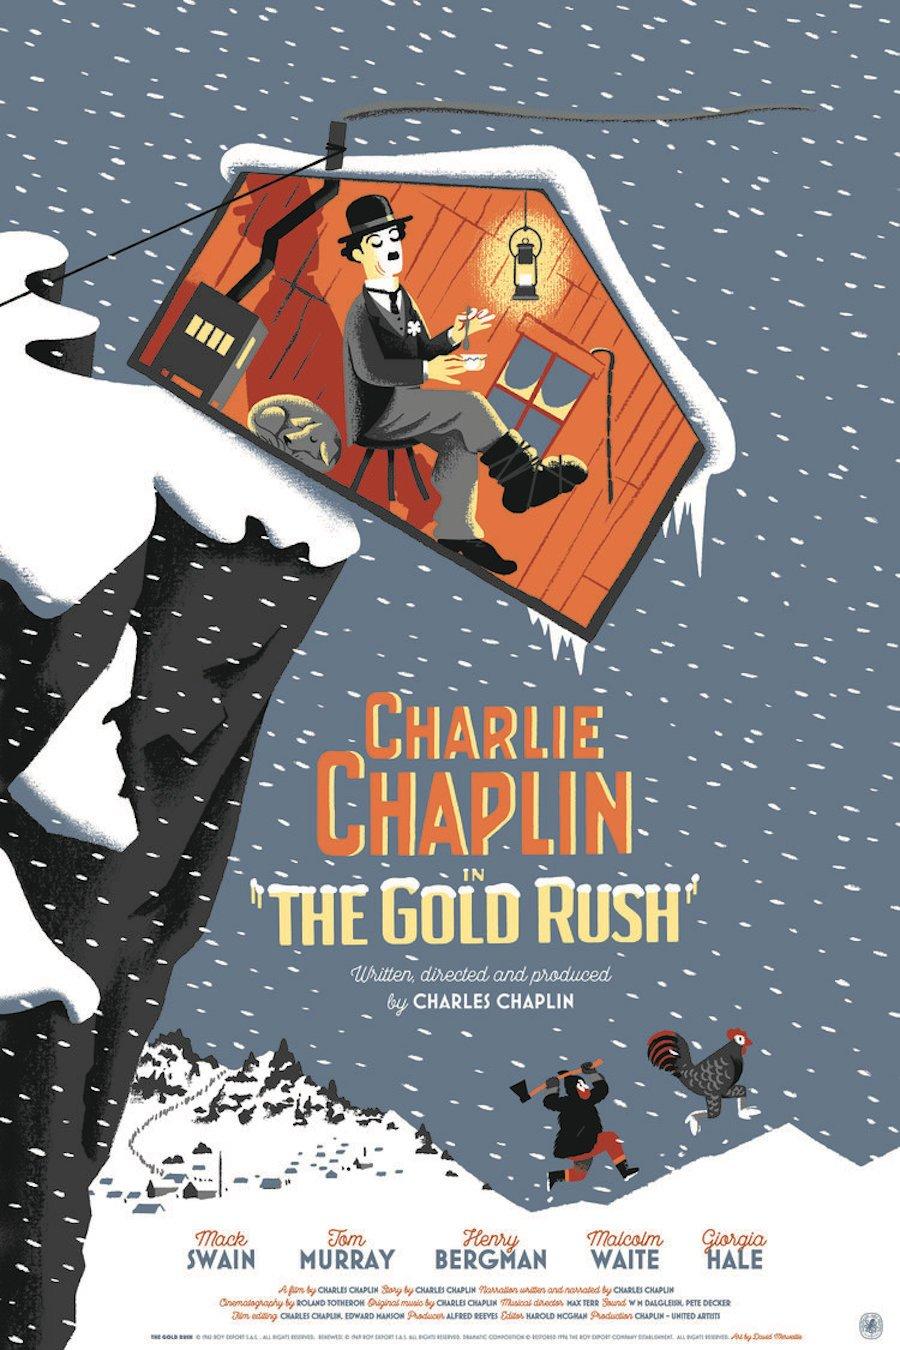 Famosos filmes de Charlie Chaplin se tornaram lindas ilustracoes